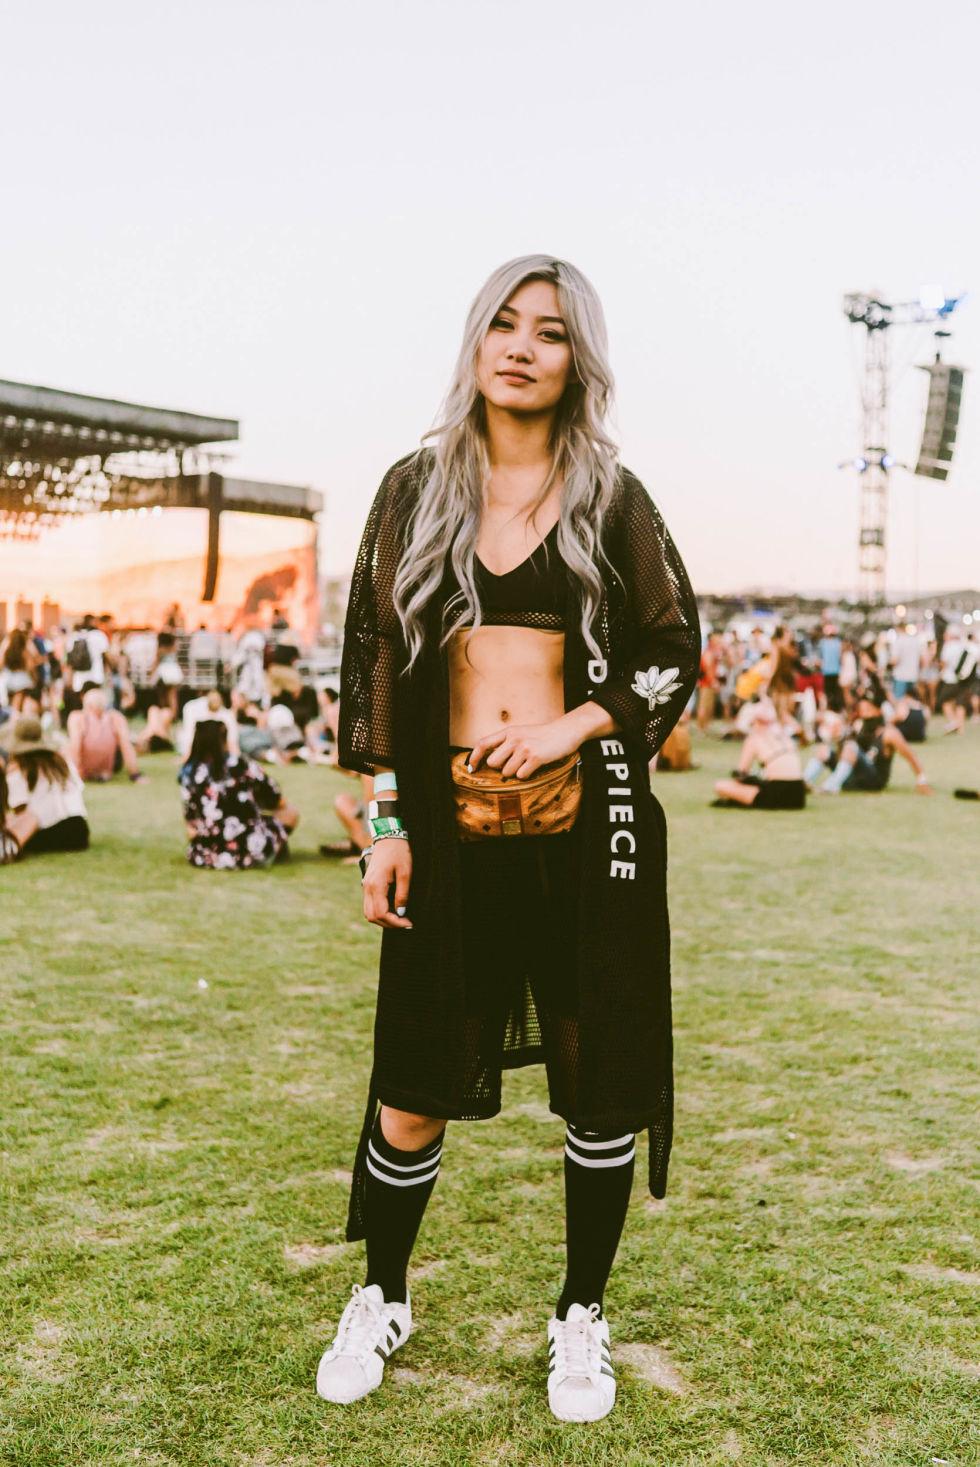 Street Style Coachella 2015 Music Festivals Fashion Trendsetters Itgirls Front Row Blog 0036 2016